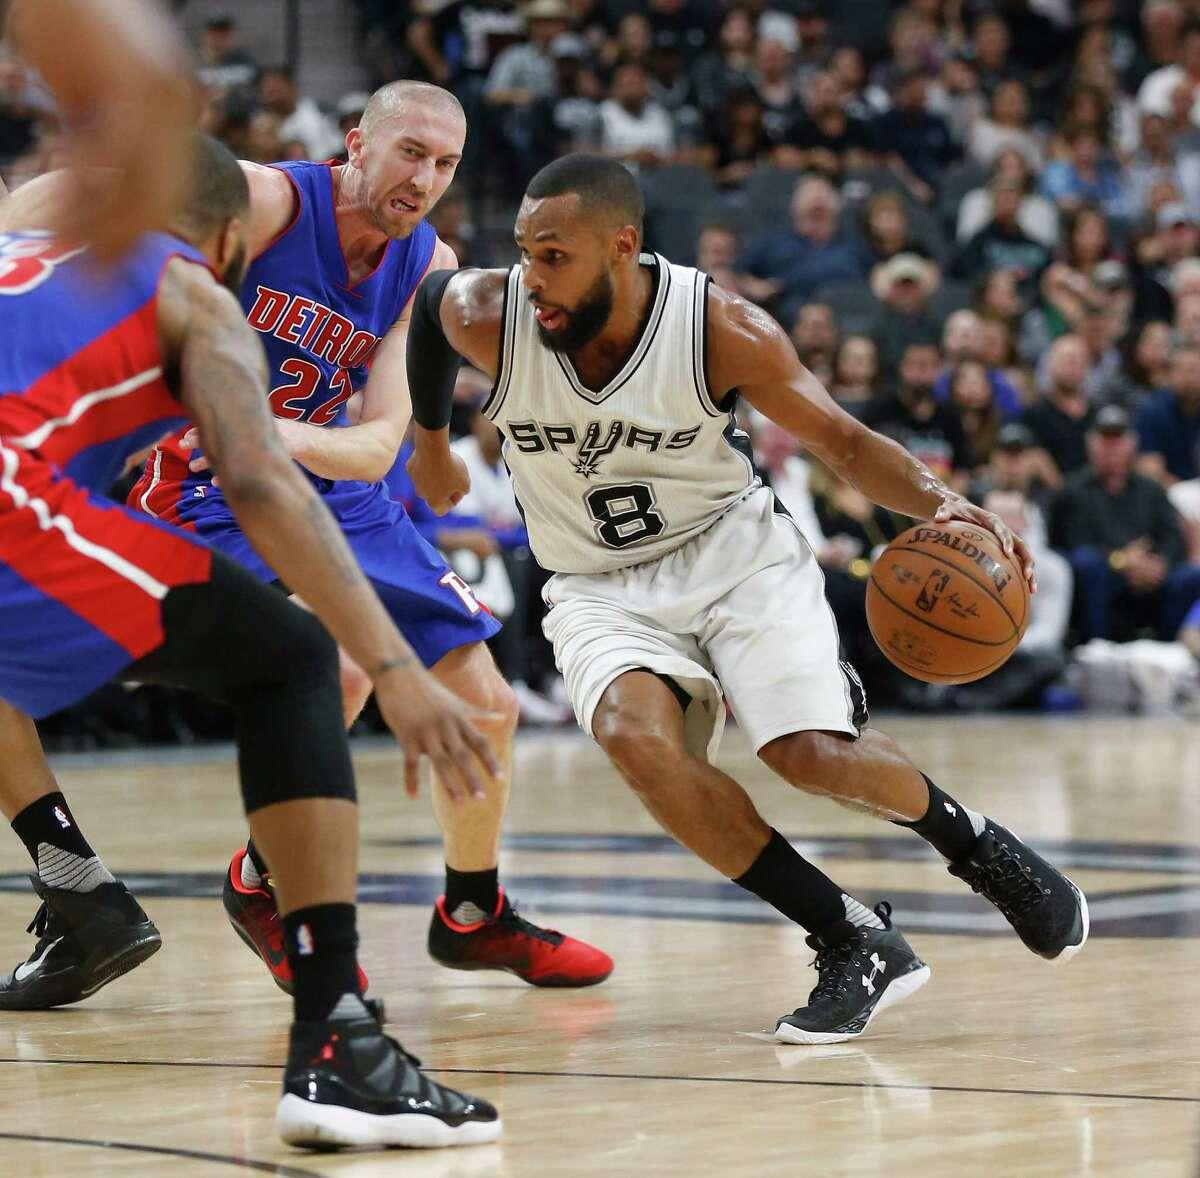 Spurs' Patty Mills (08) maneuvers around Detroit Pistons' Steve Blake (22) at the AT&T Center on Wednesday, Mar. 2, 2016. (Kin Man Hui/San Antonio Express-News)